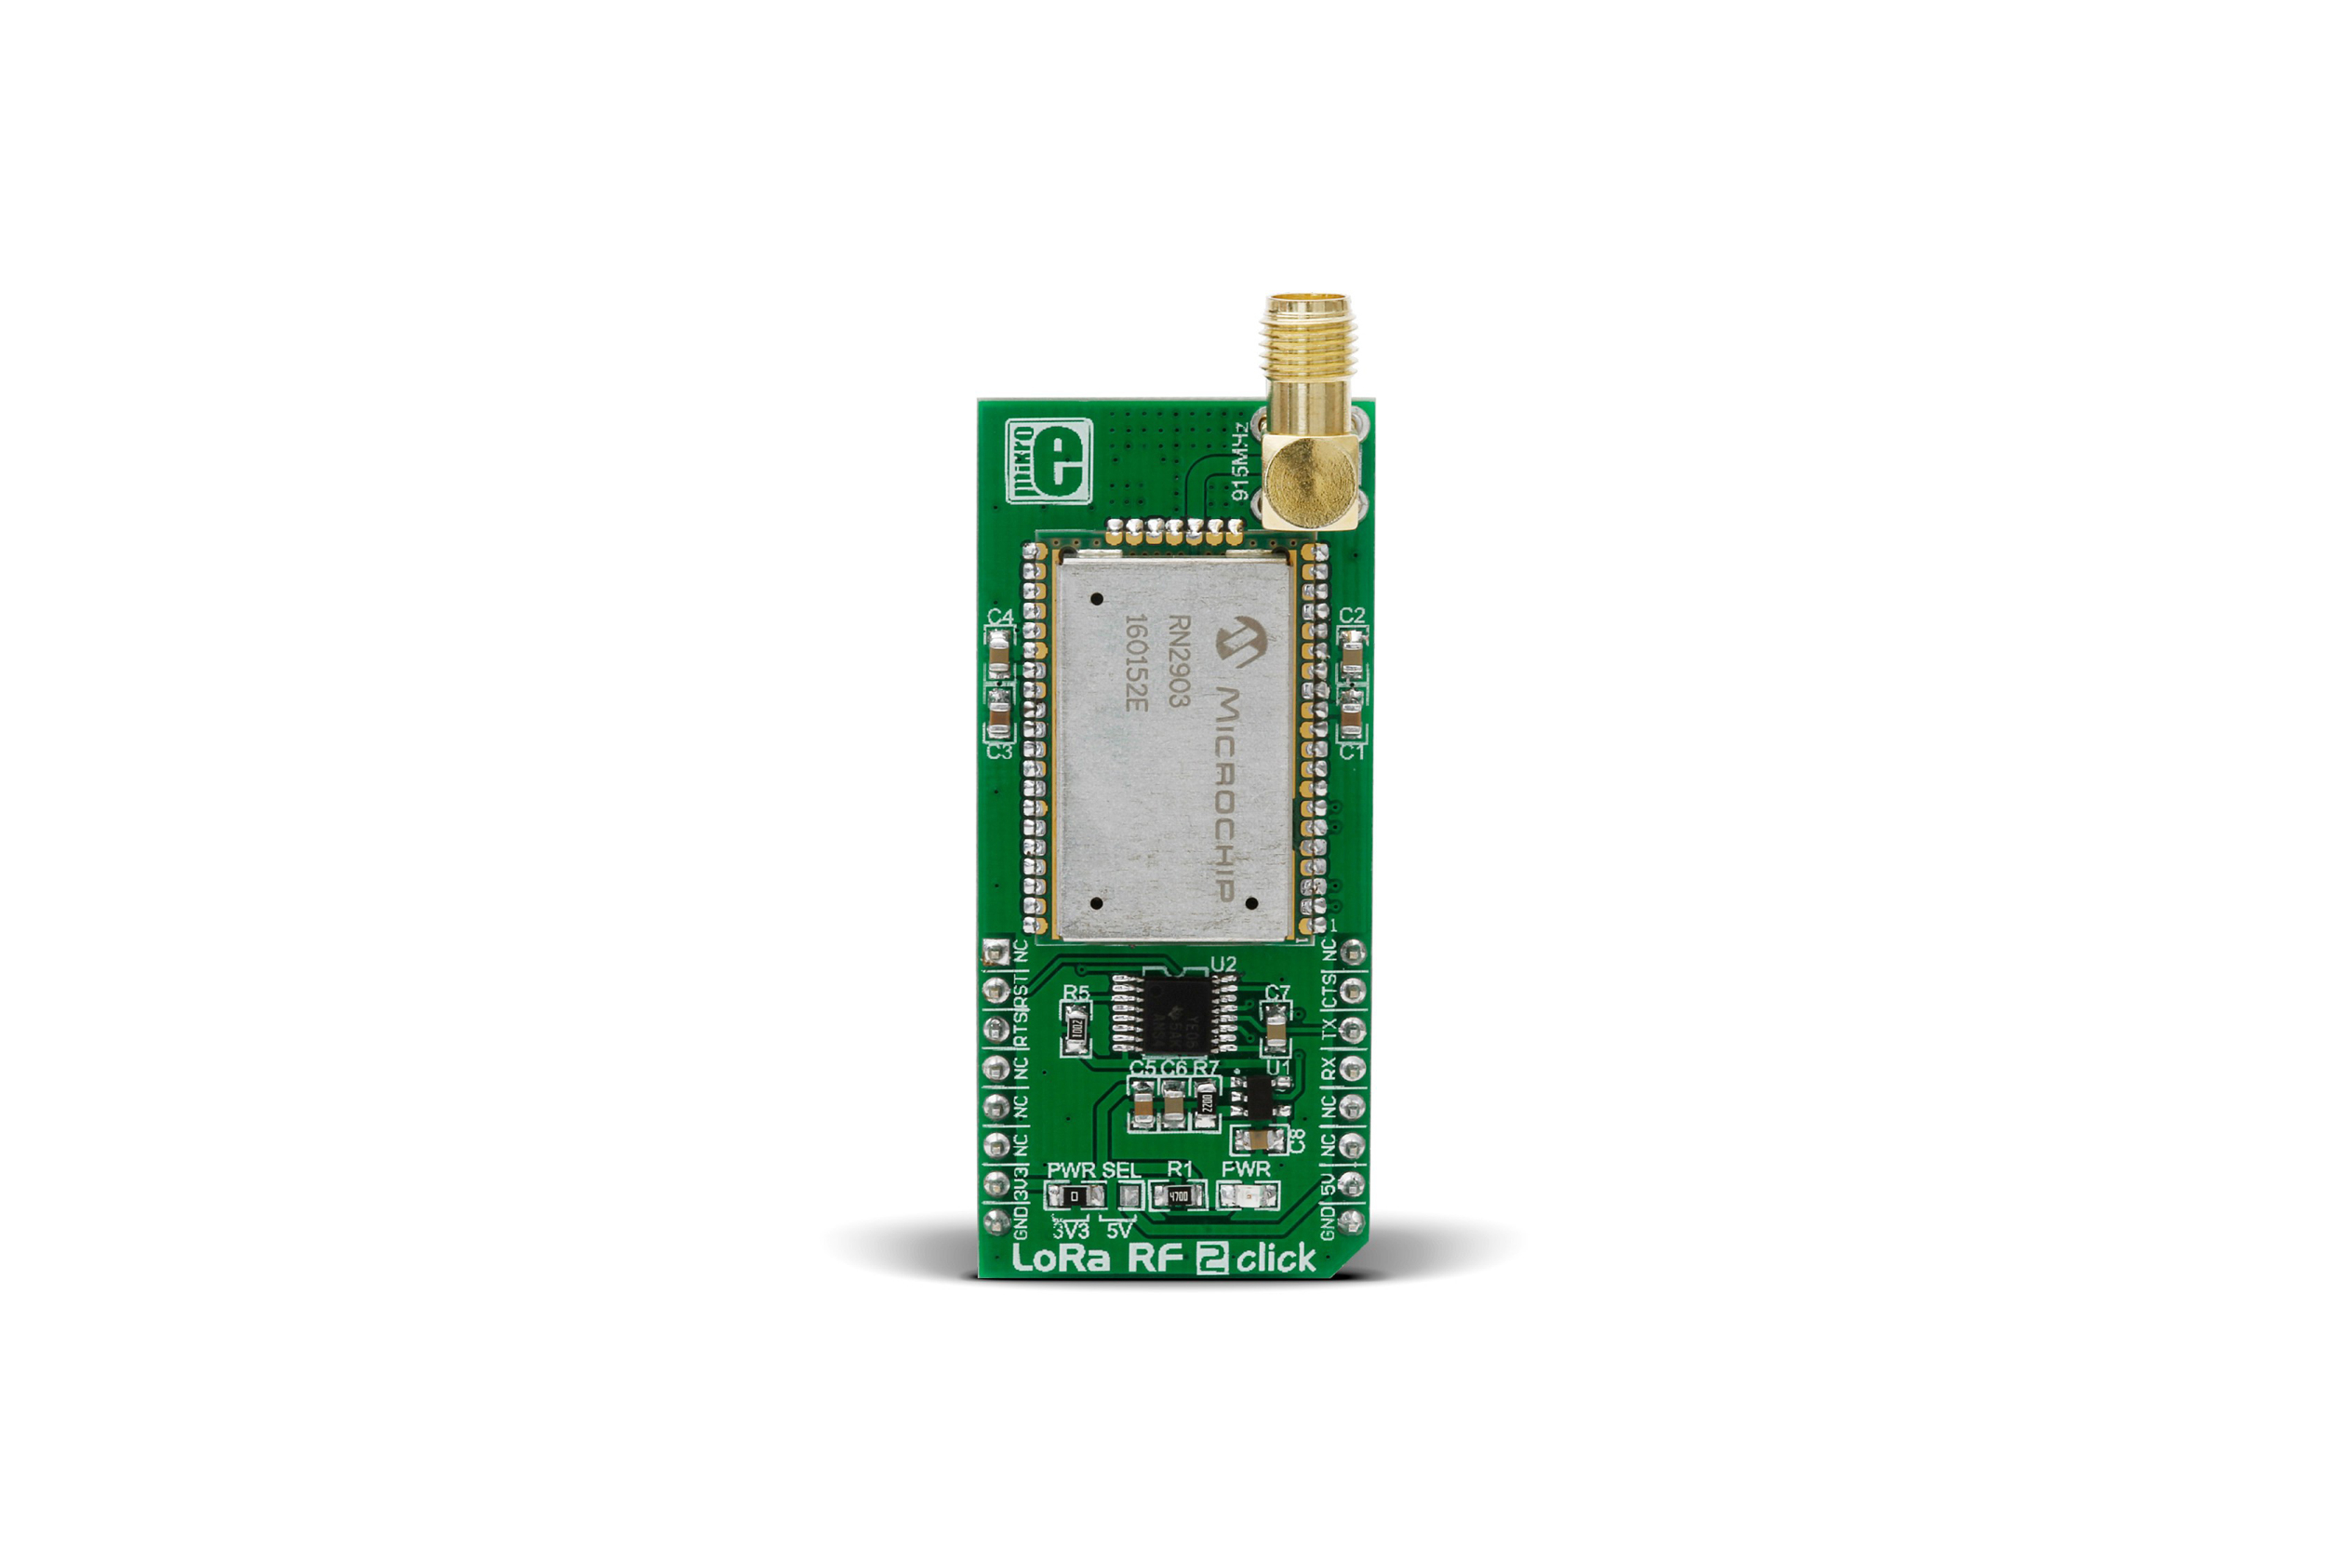 MikroElektronika LoRa(ローラ) 2 mikroBUS クリックボード(RN2903用)